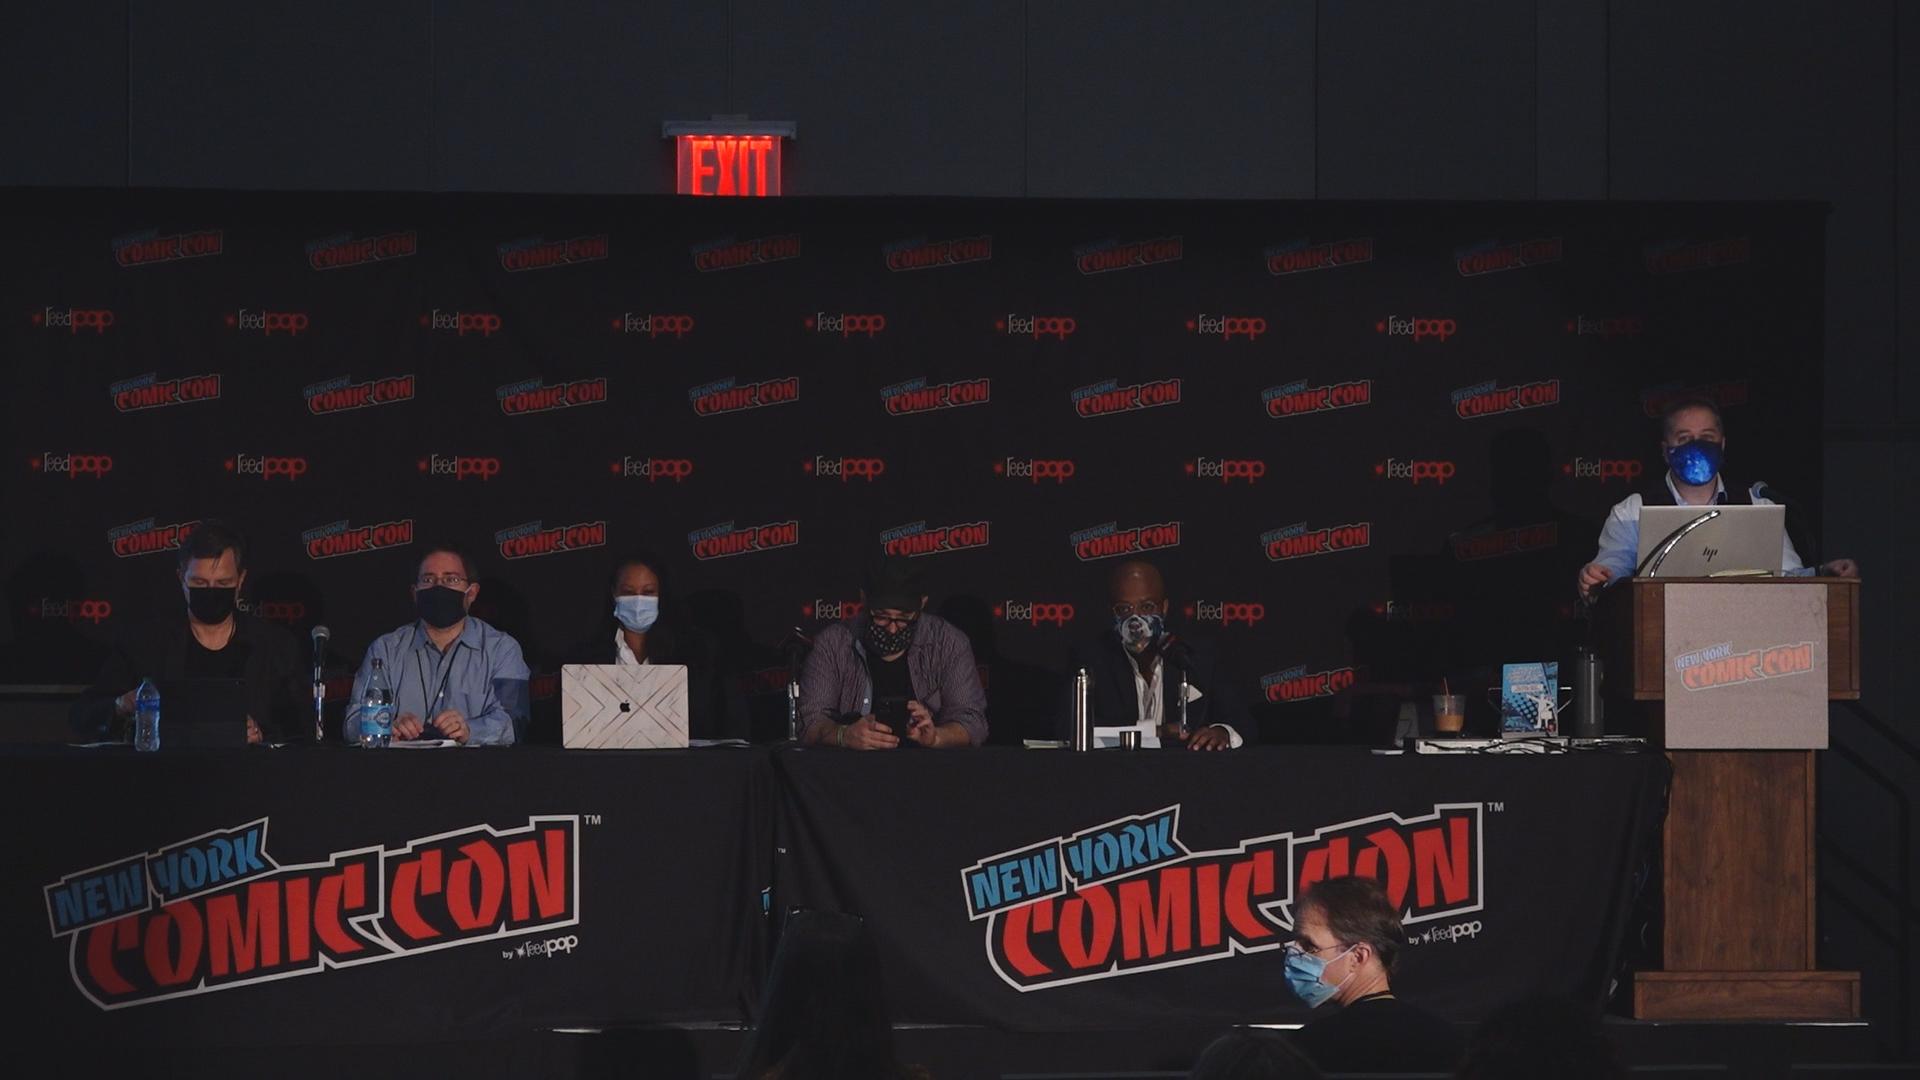 Representing Comic Book Creator Clients Thumbnail